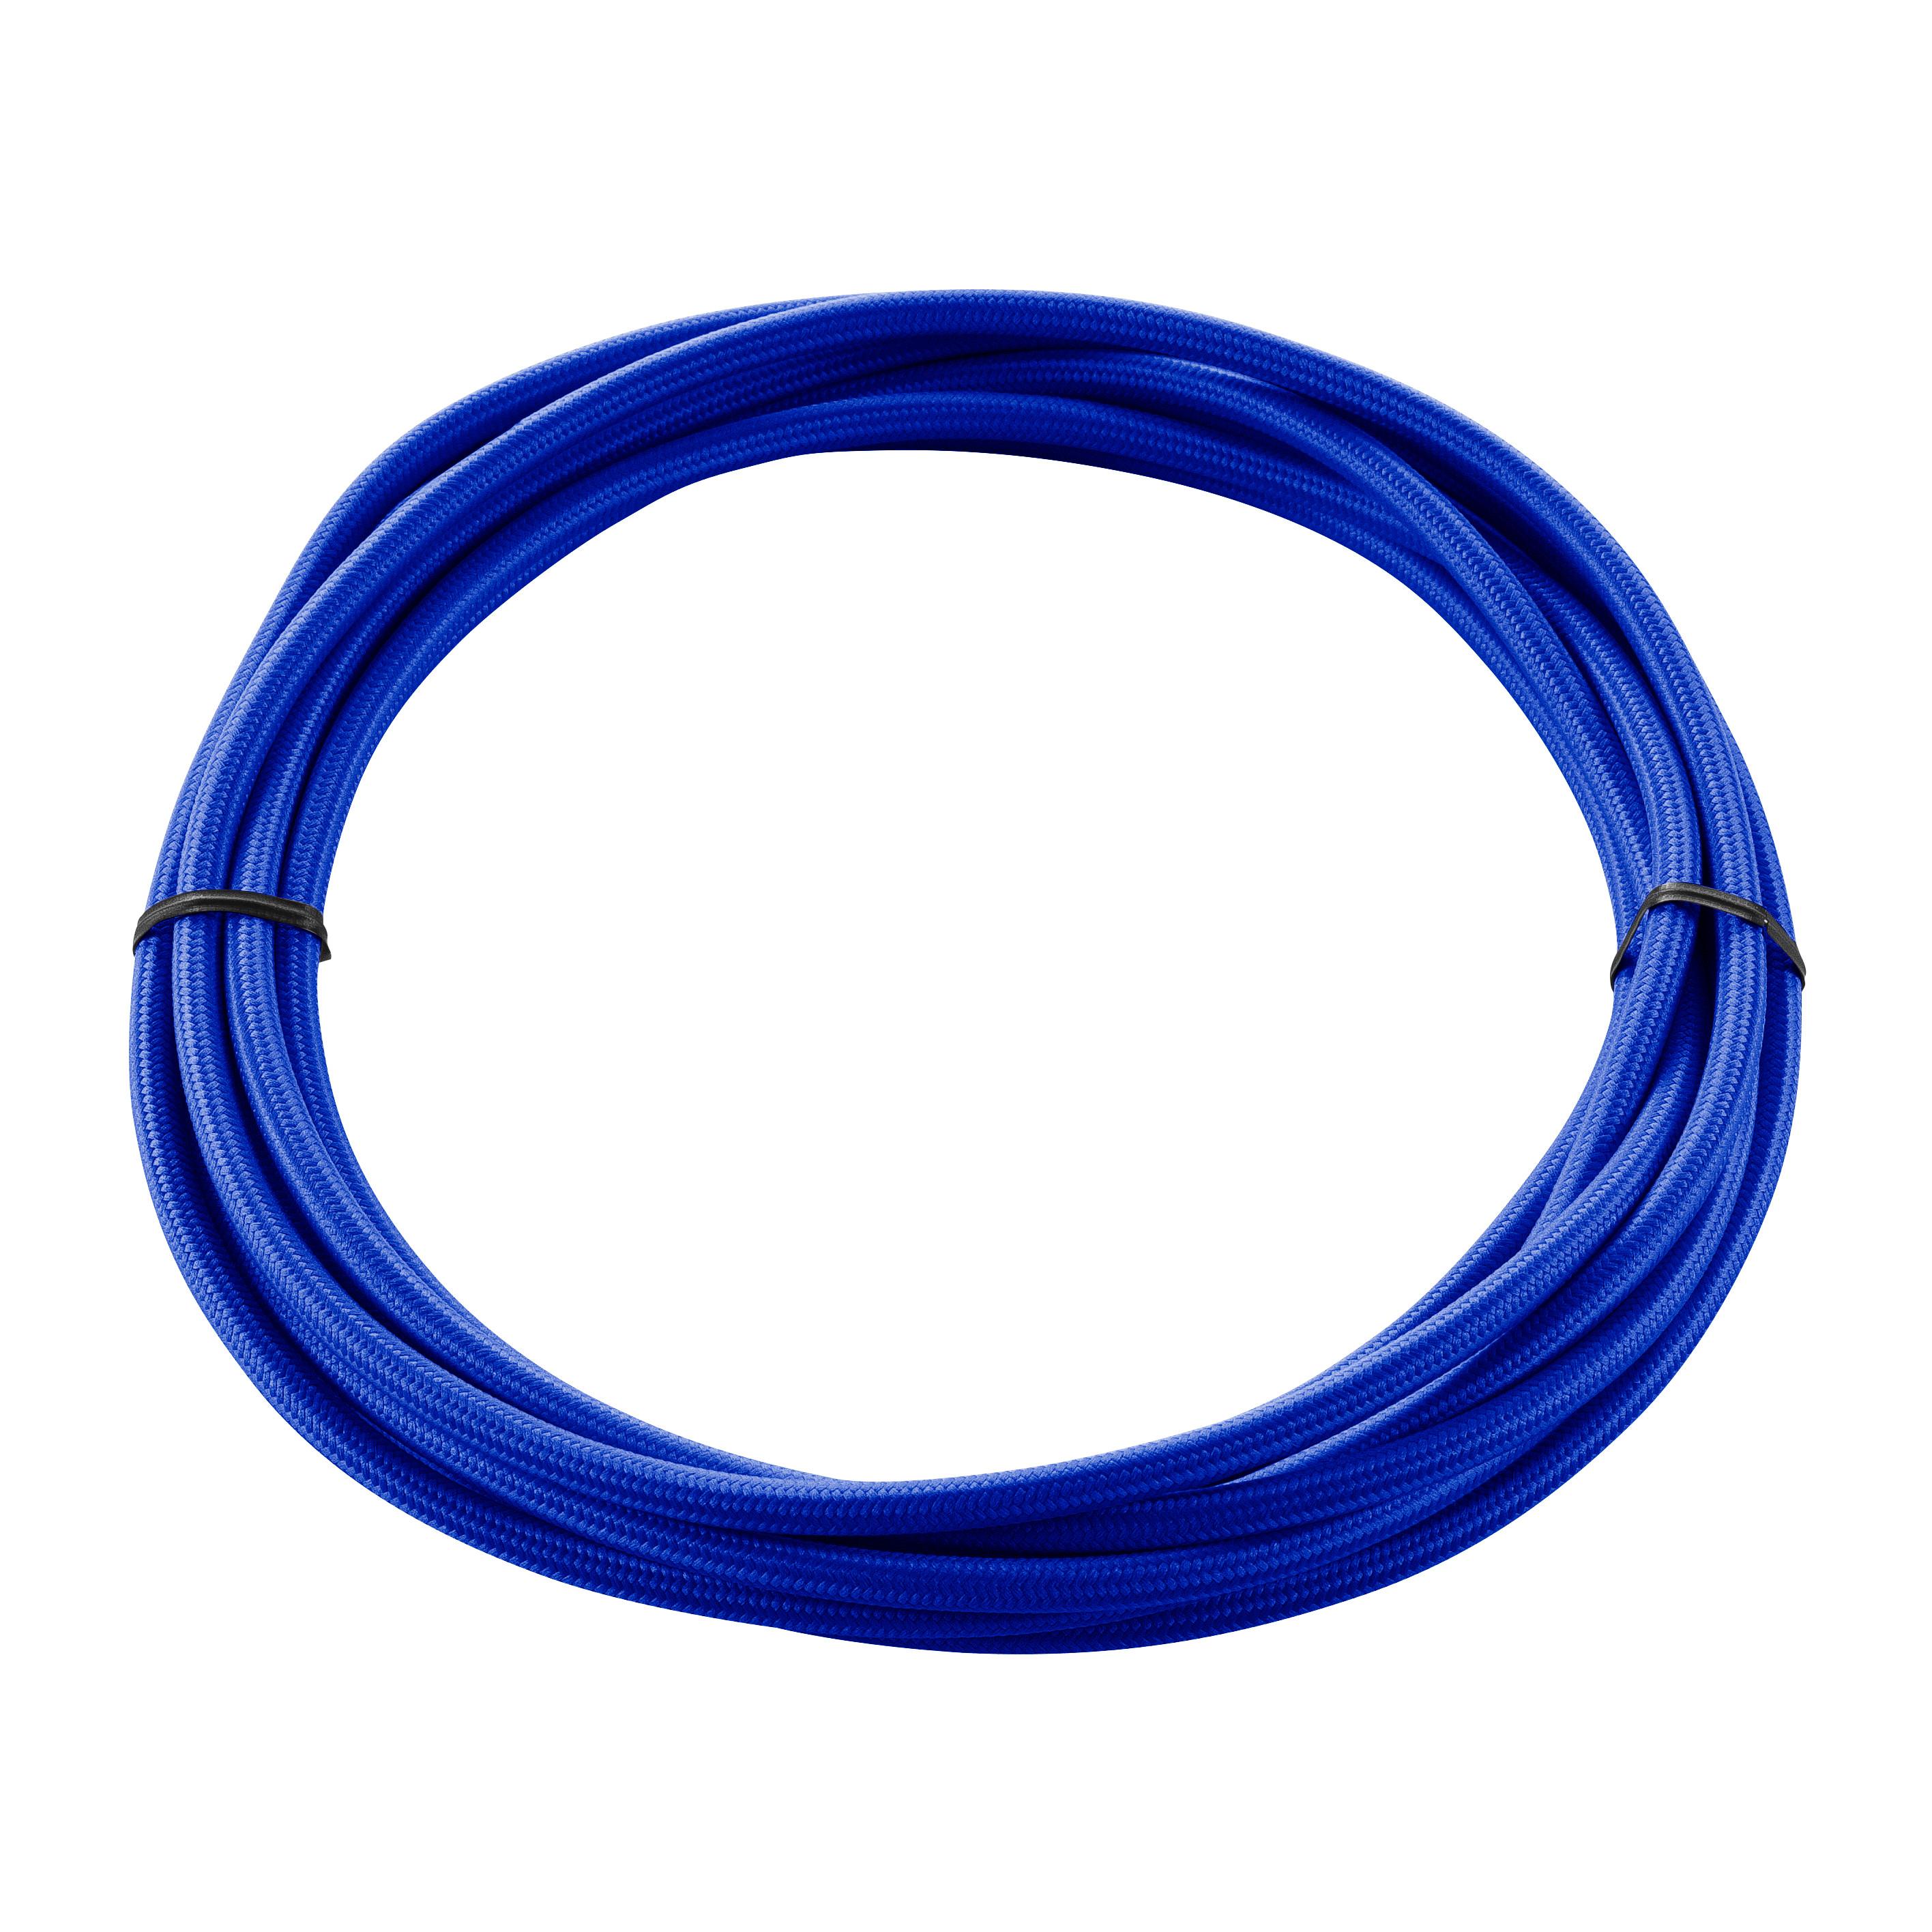 1 Stk TEXTILKABEL, 3-polig, 5 m, blau LI961373--